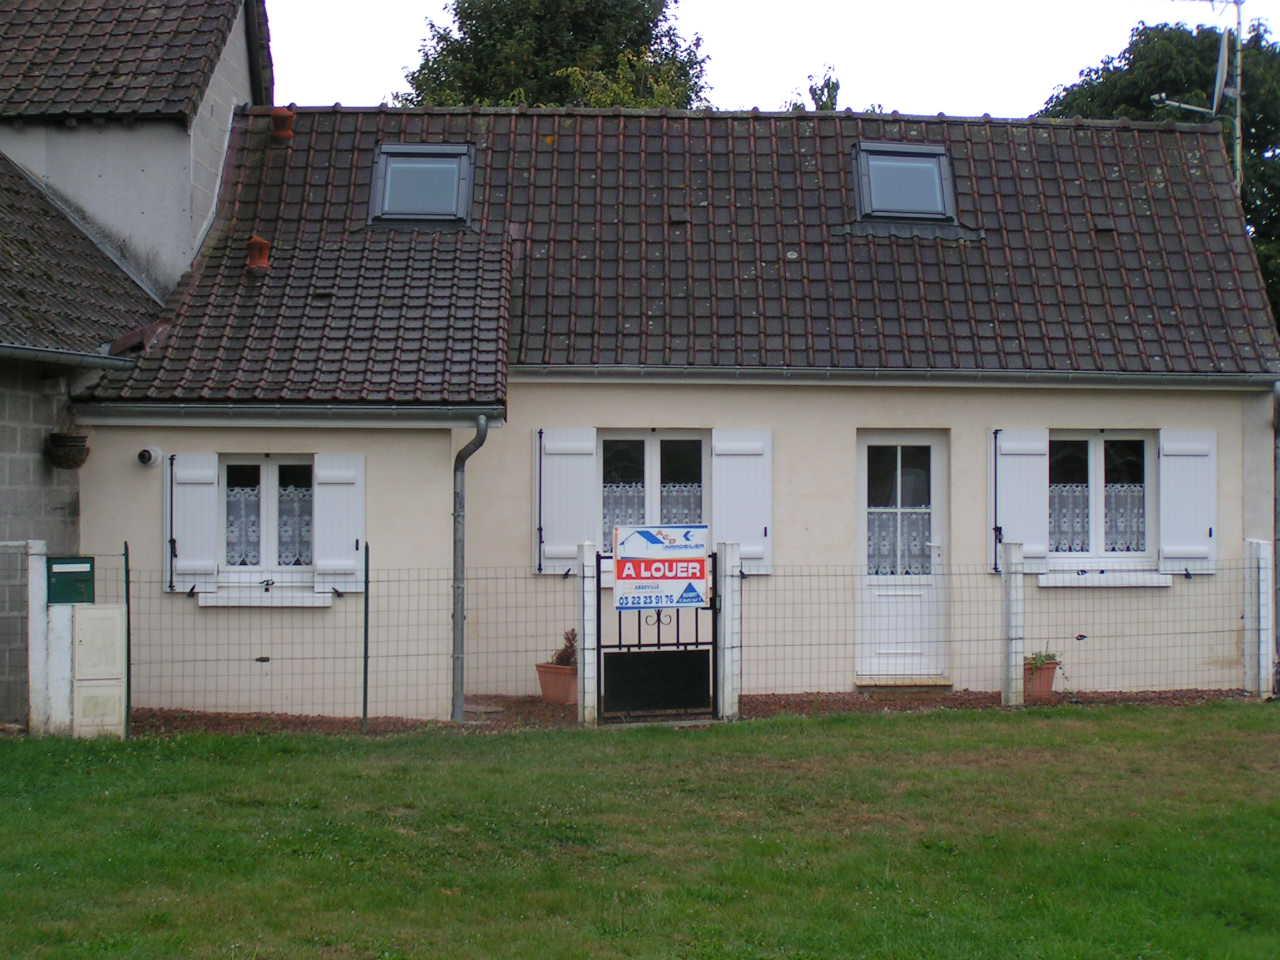 Agence immobiliere acd abbeville maison a louer segu maison for Agence location maison